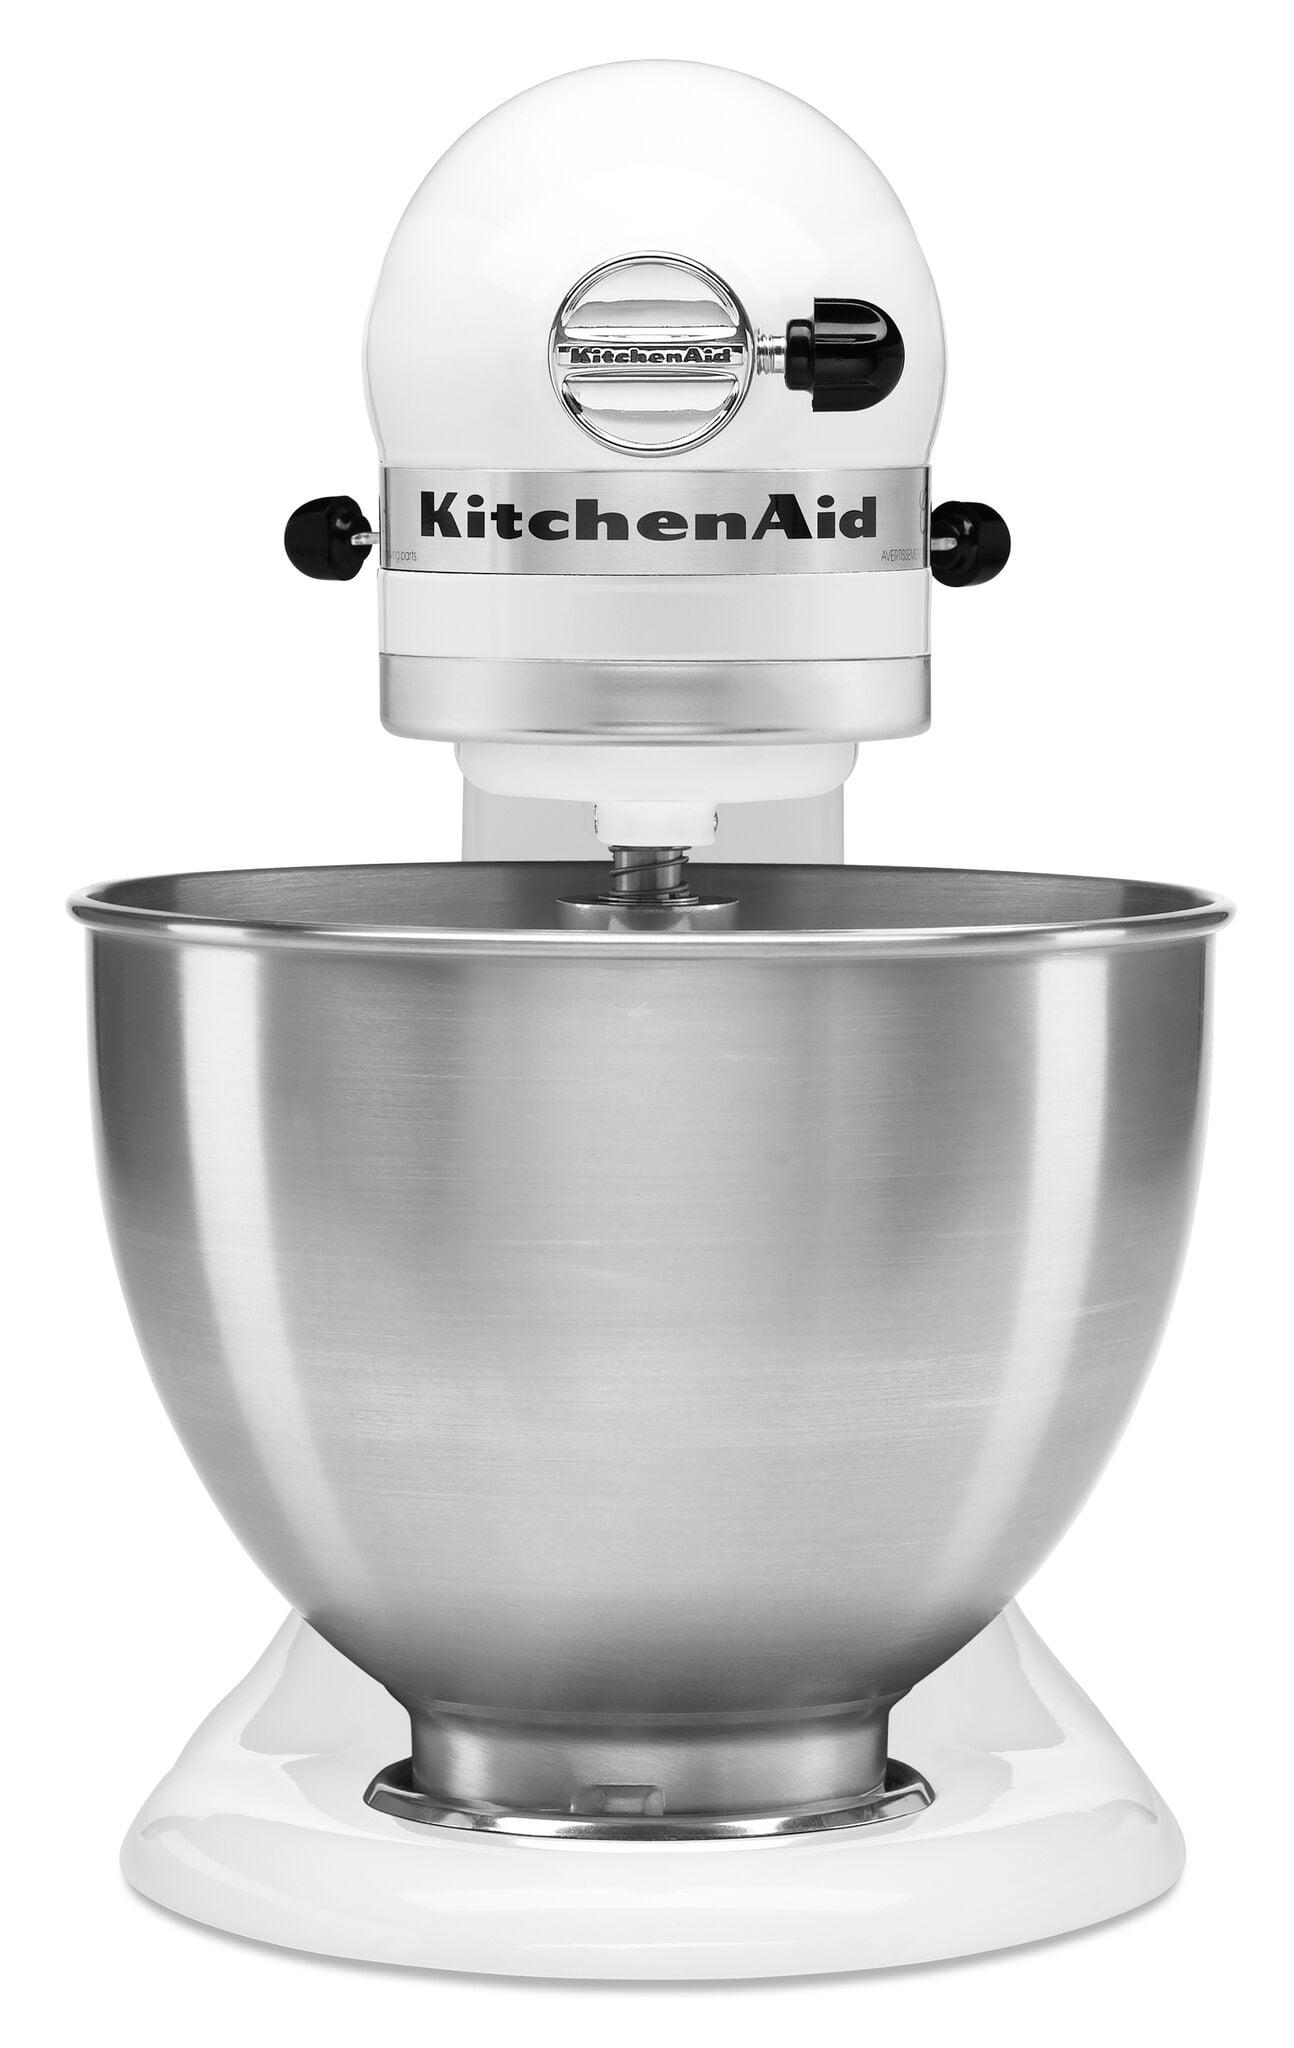 Beautiful KitchenAid Classic Series 4.5 Quart Tilt Head Stand Mixer, White (K45SSWH)    Walmart.com